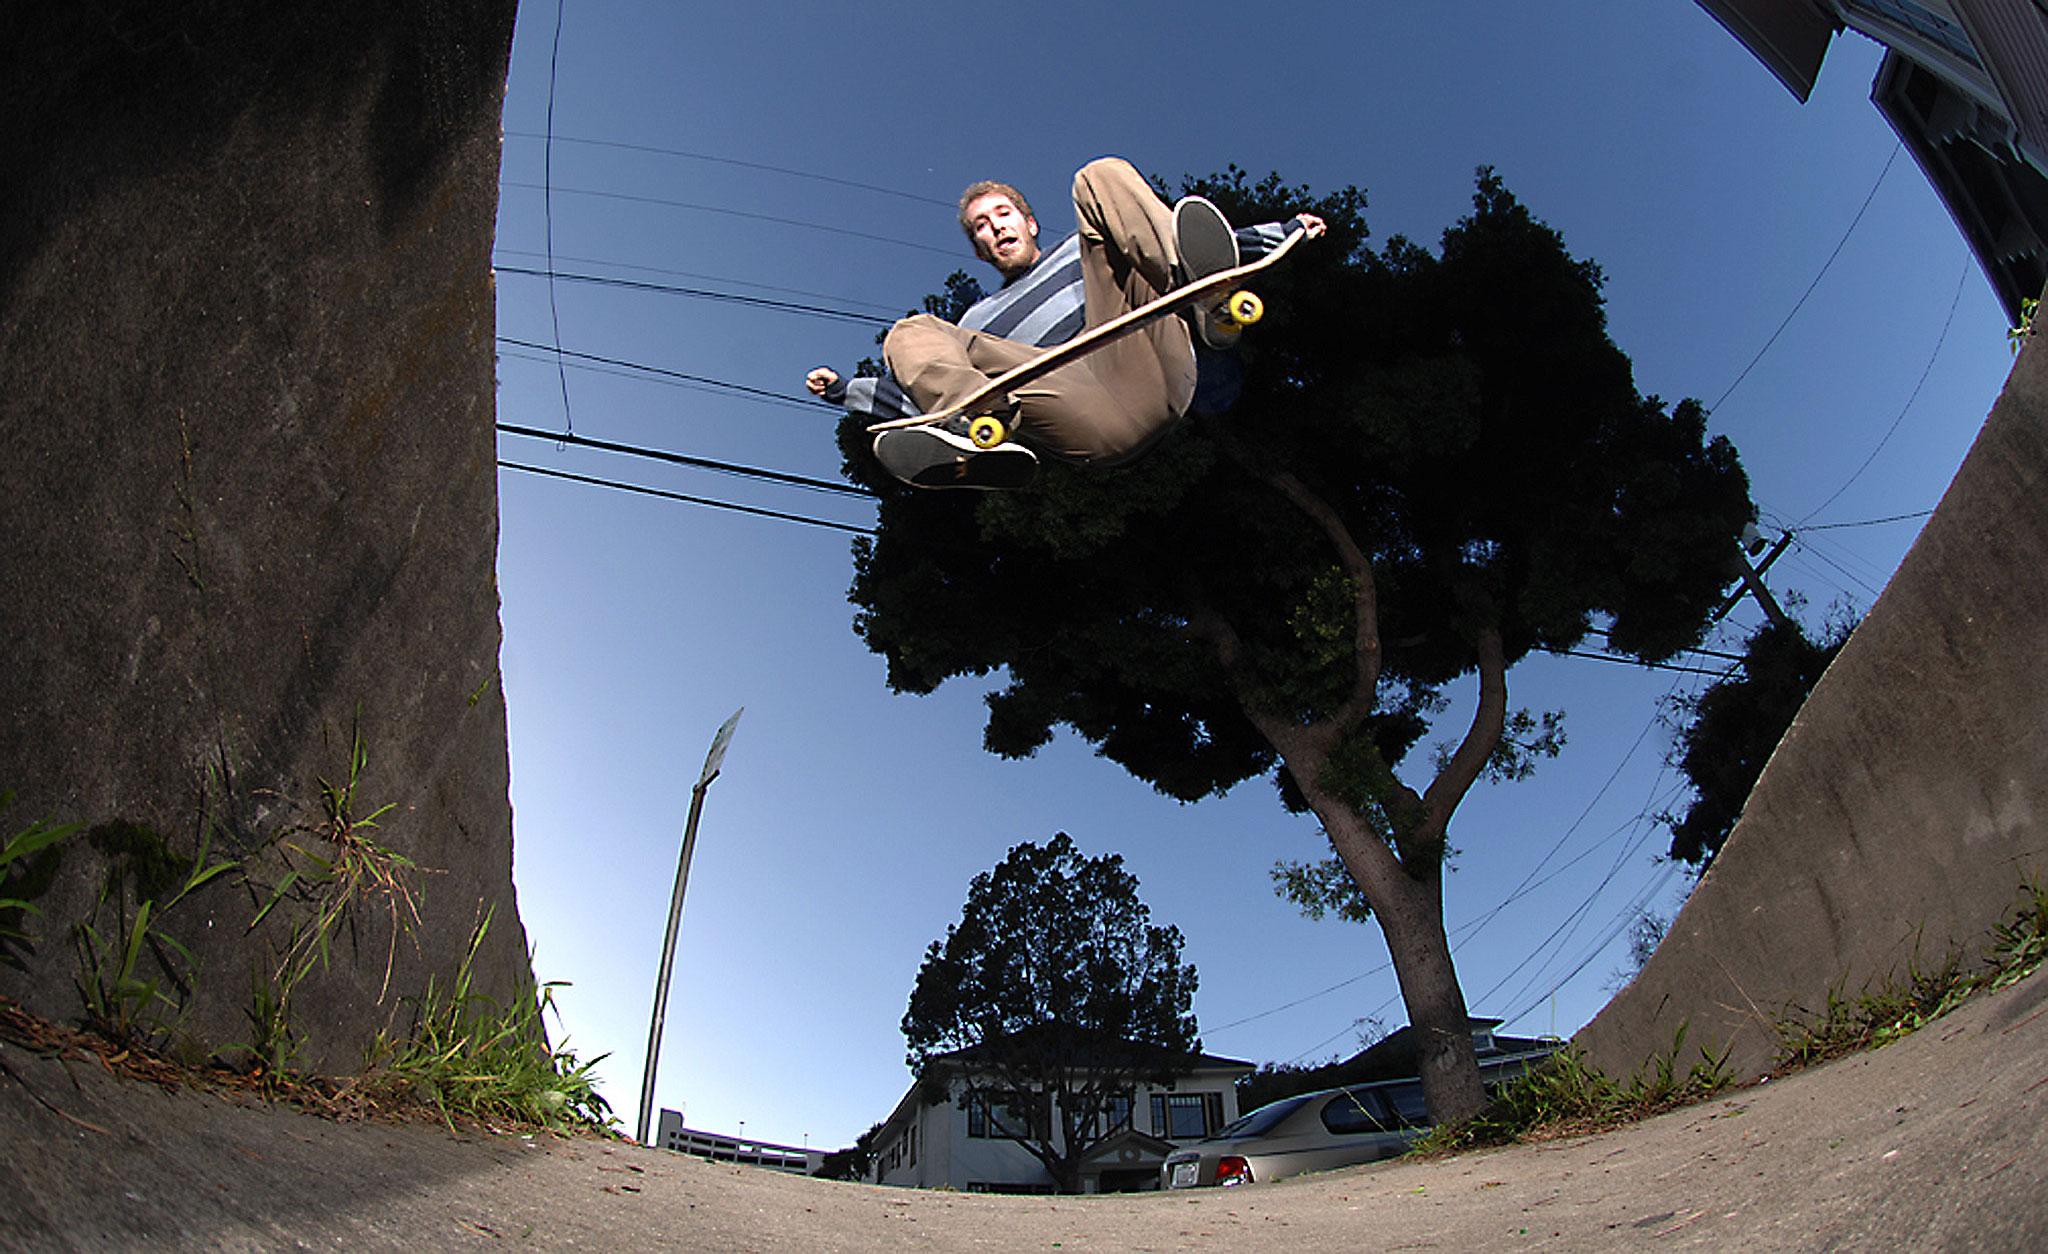 Greg Millions, Kickflip